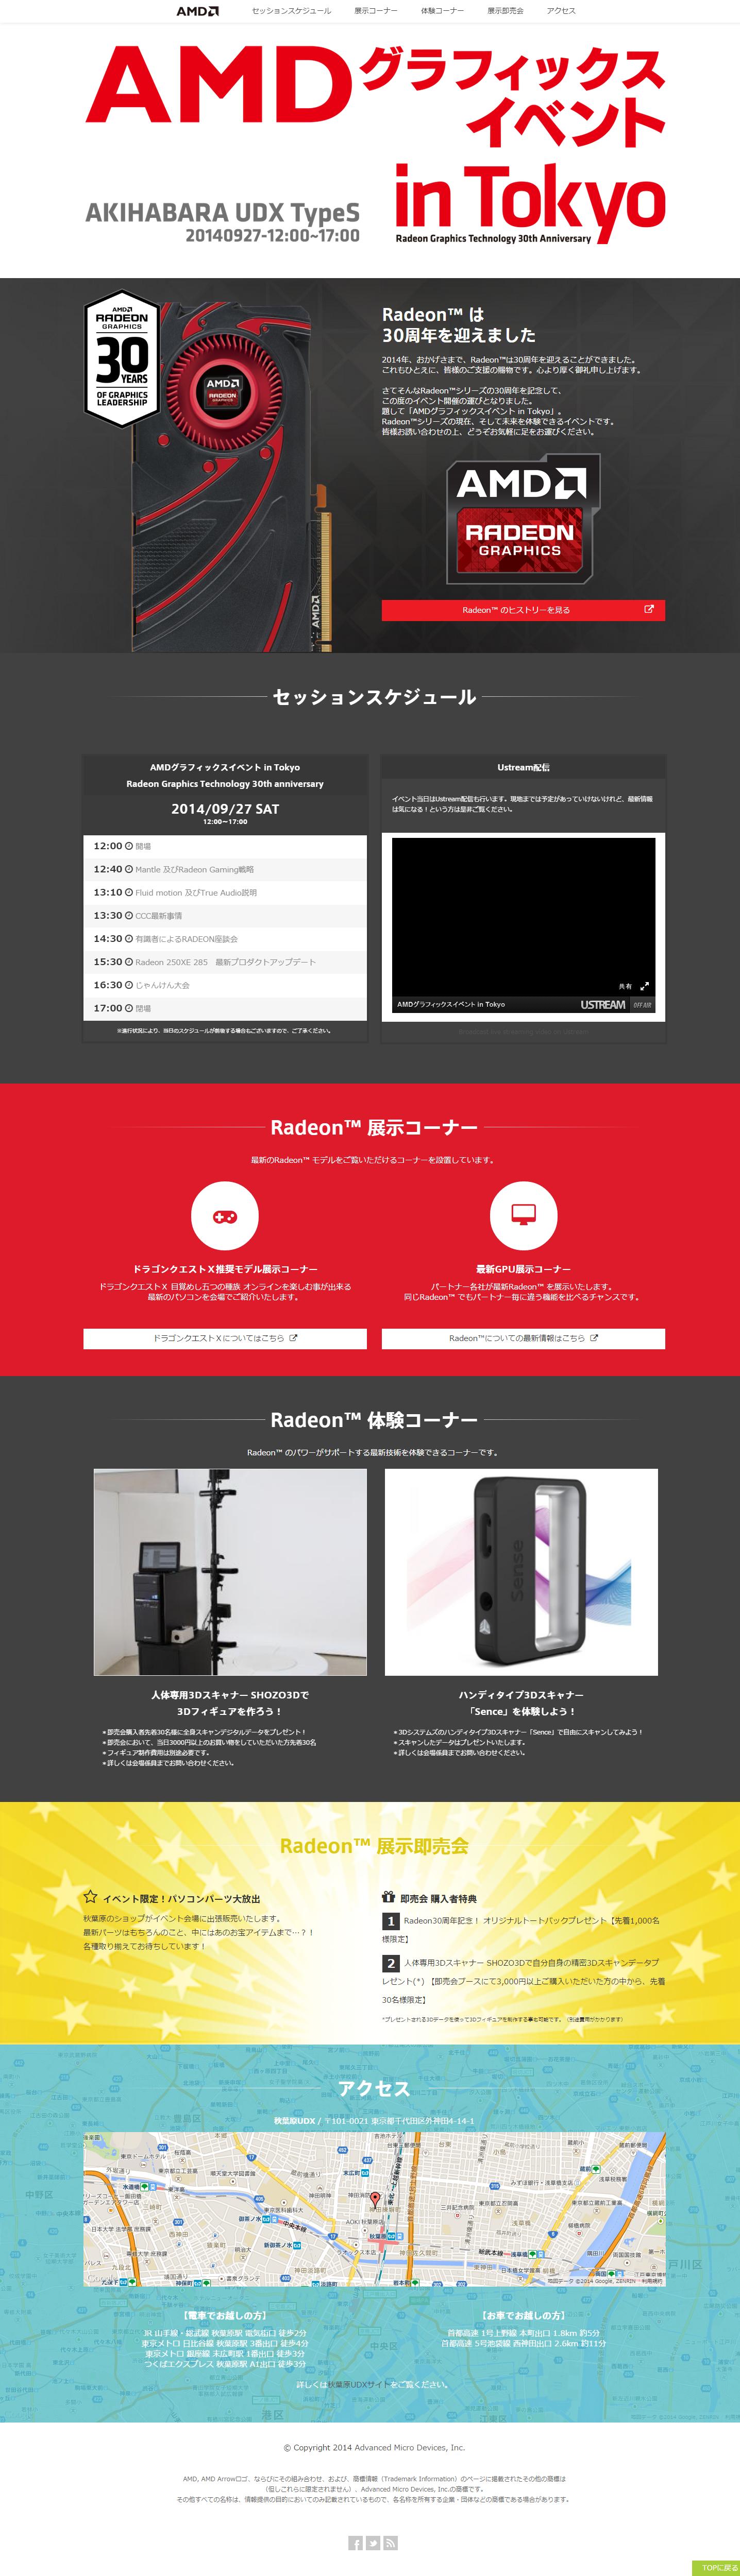 AMDグラフィックスイベント in Tokyo|Radeon Graphics Technology 30th anniversary